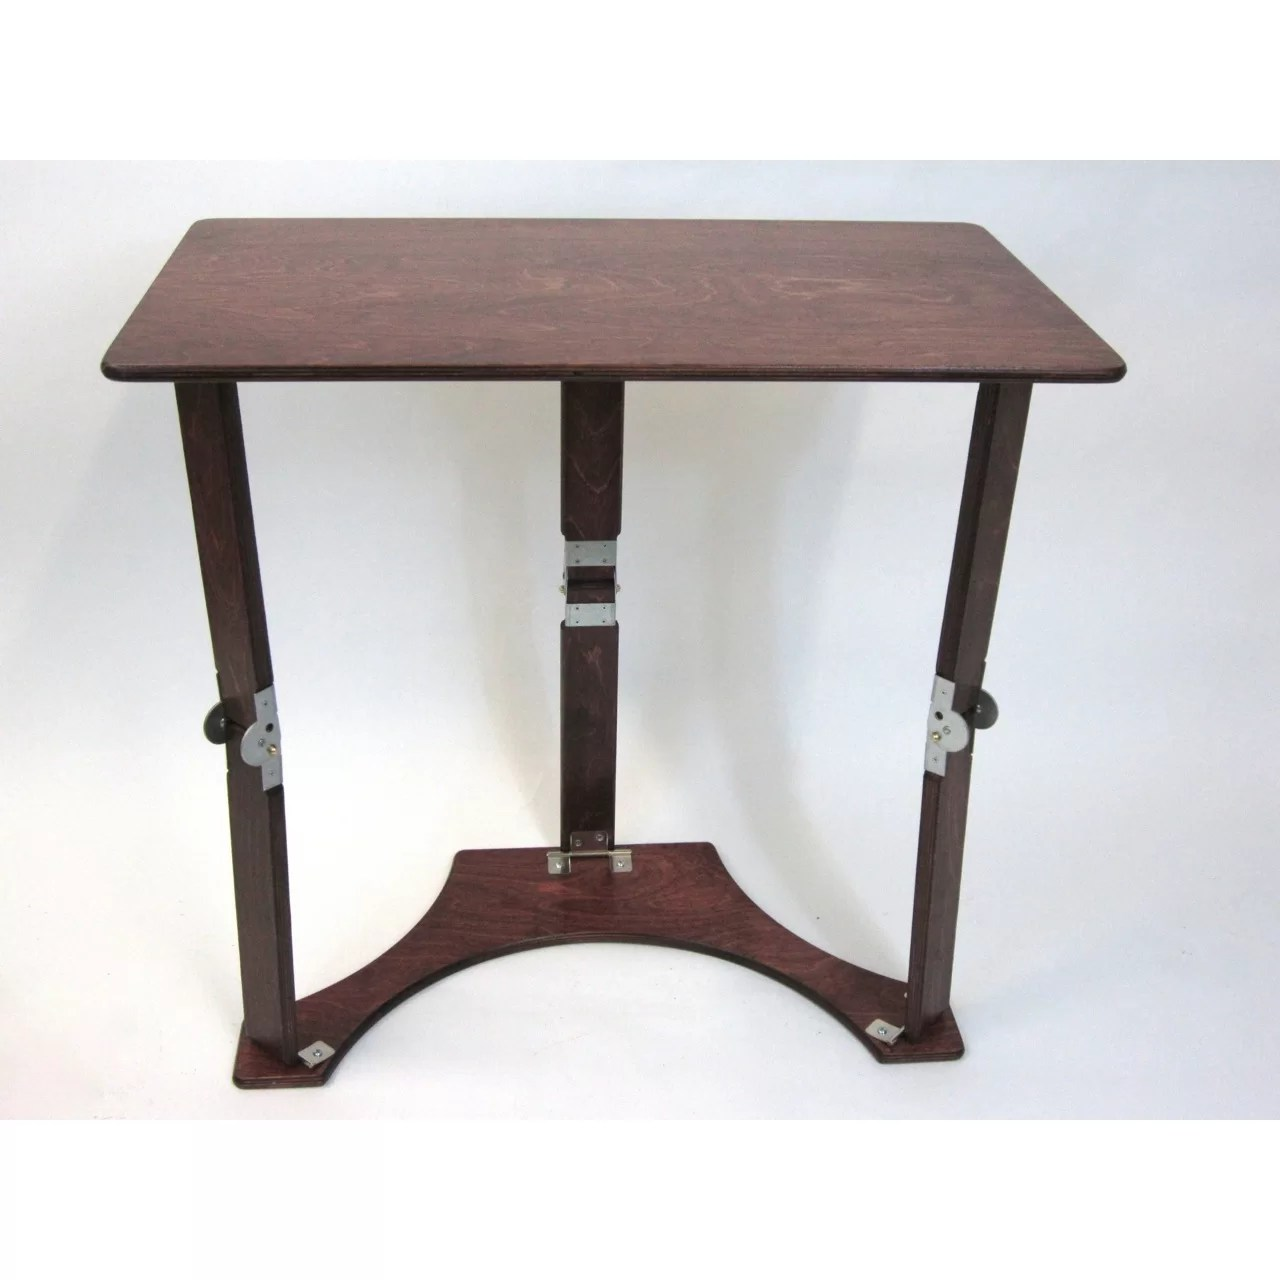 Spiderlegs Folding Laptop Desk/Tray Table & Reviews